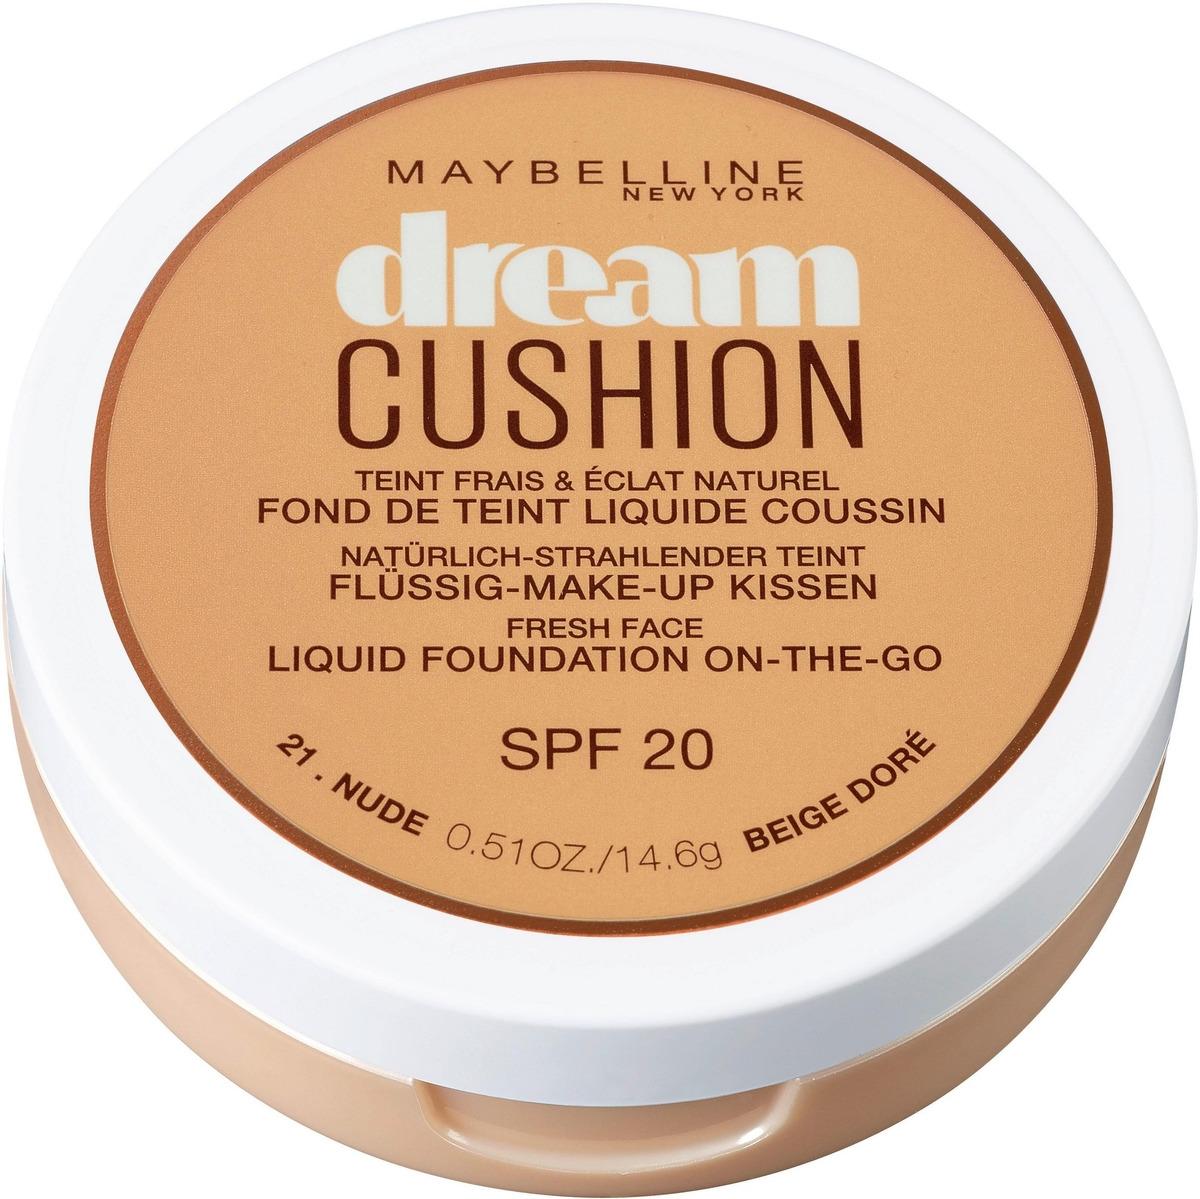 Maybelline New York Тональный крем-кушон для лица Dream Cushion, увлажняющий, оттенок 21 Nude, SPF 20, 14,6 г